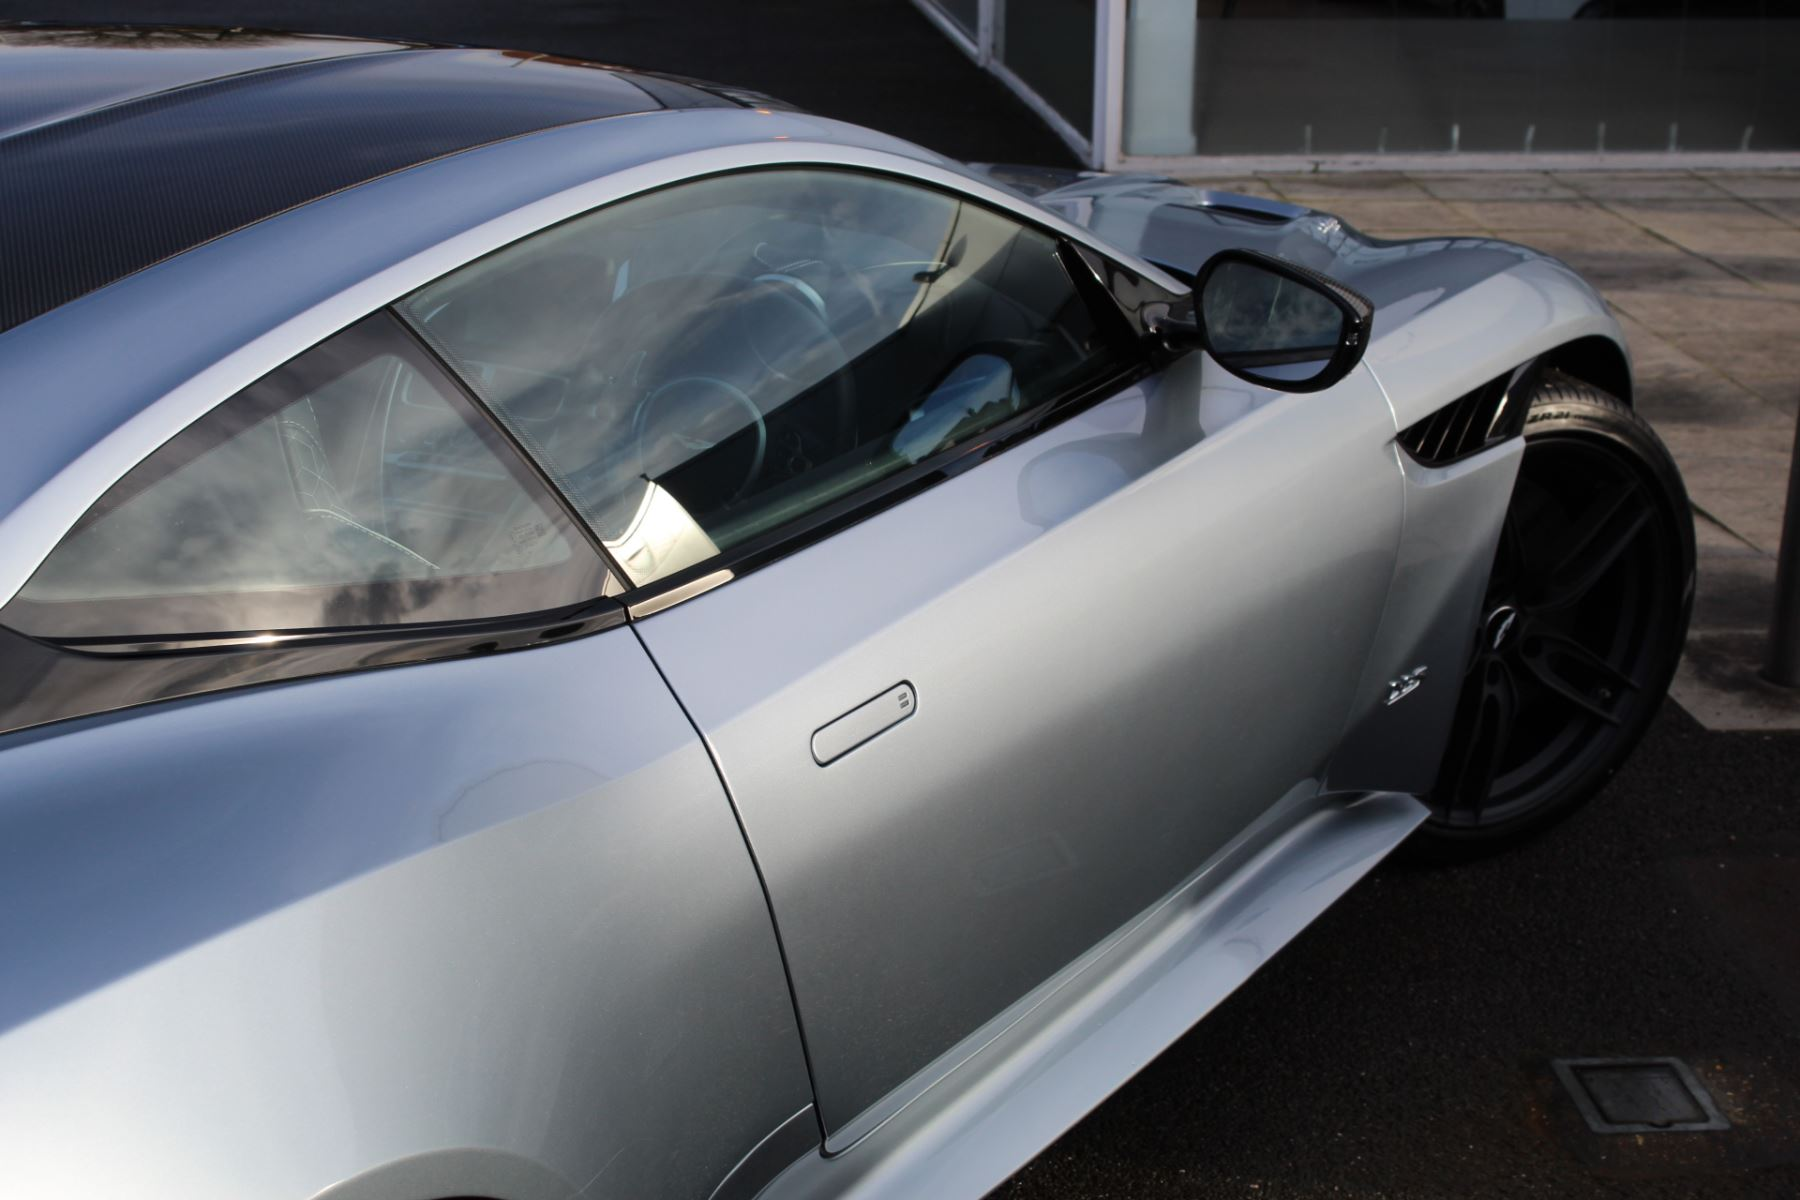 Aston Martin DBS Superleggera V12 2dr Touchtronic image 25